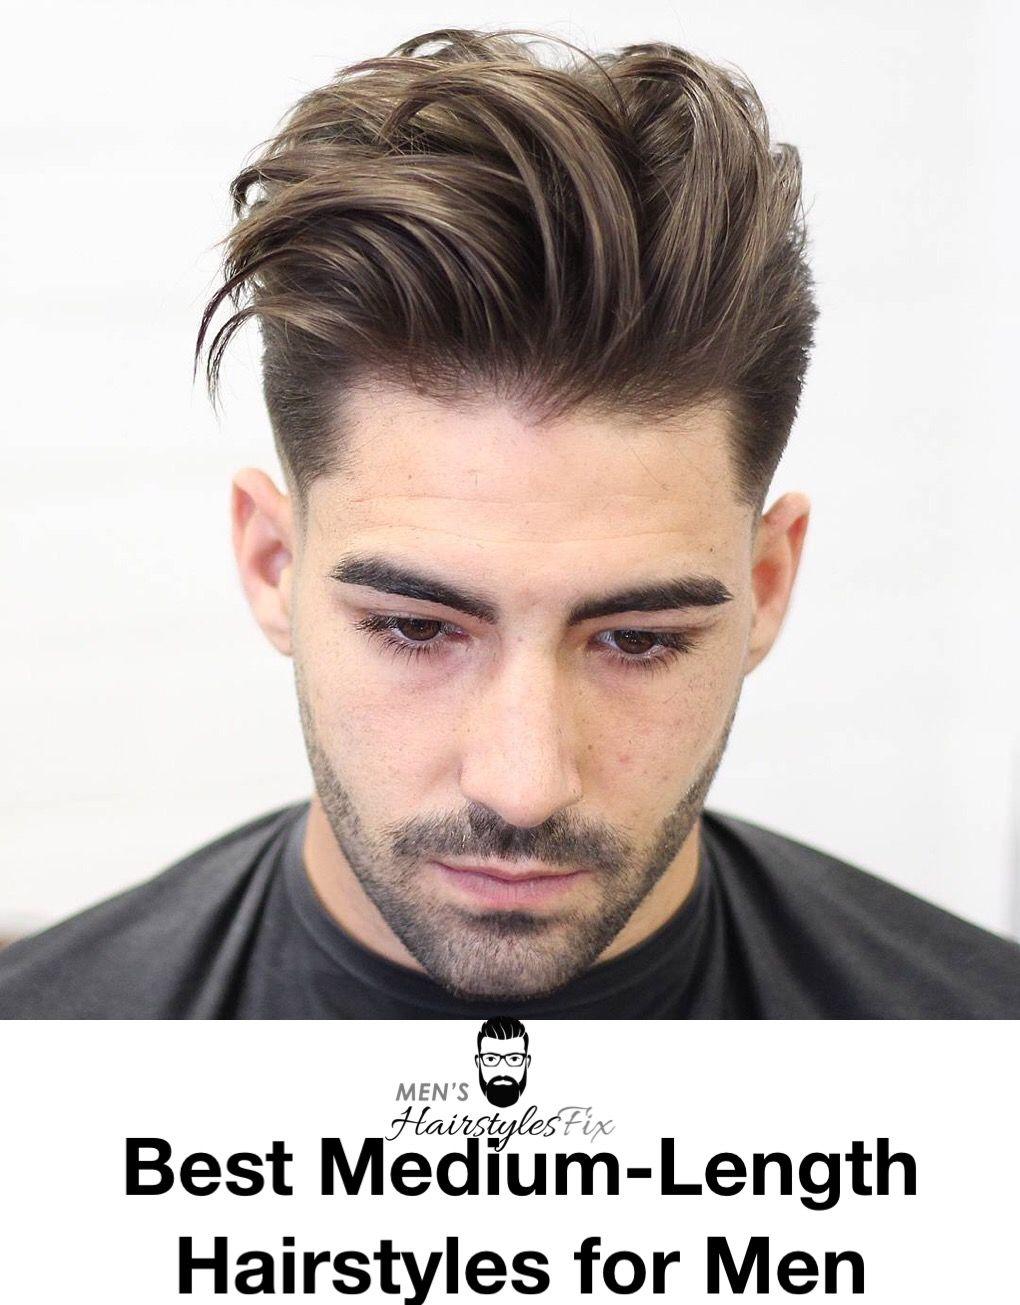 20 Best Medium Length Hairstyles For Men In 2018 Medium Length